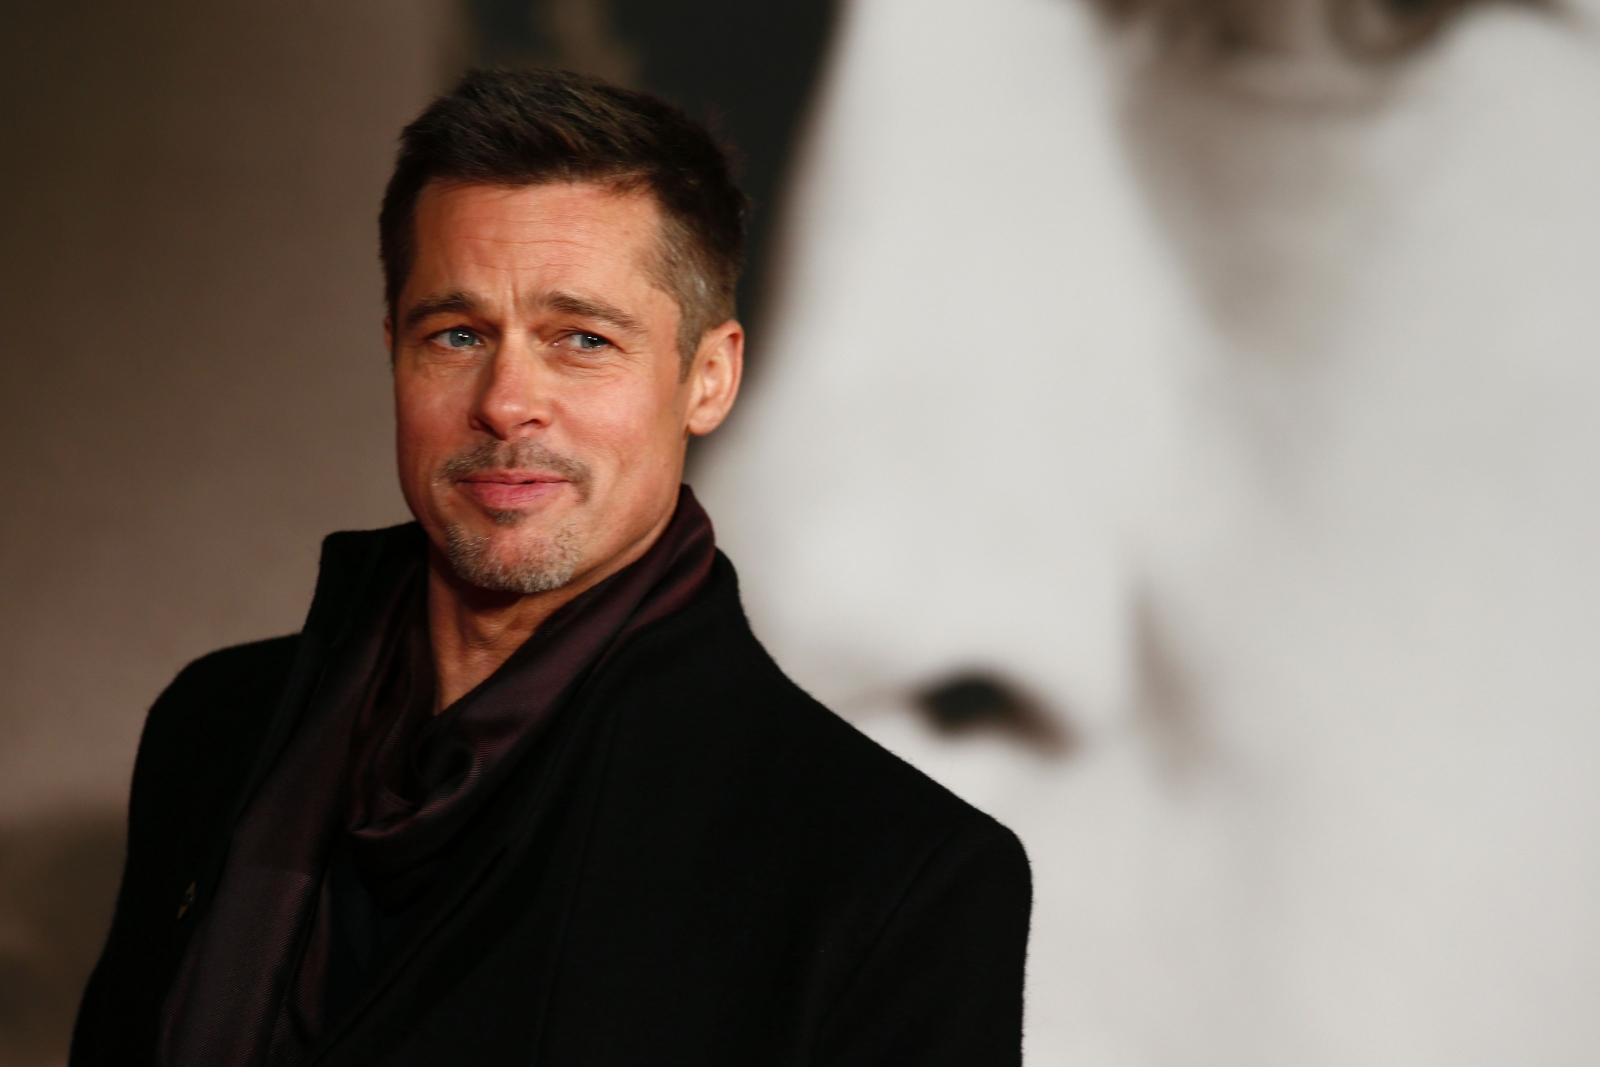 Angelina Jolie, Brad Pitt's Divorce to be Private Affair